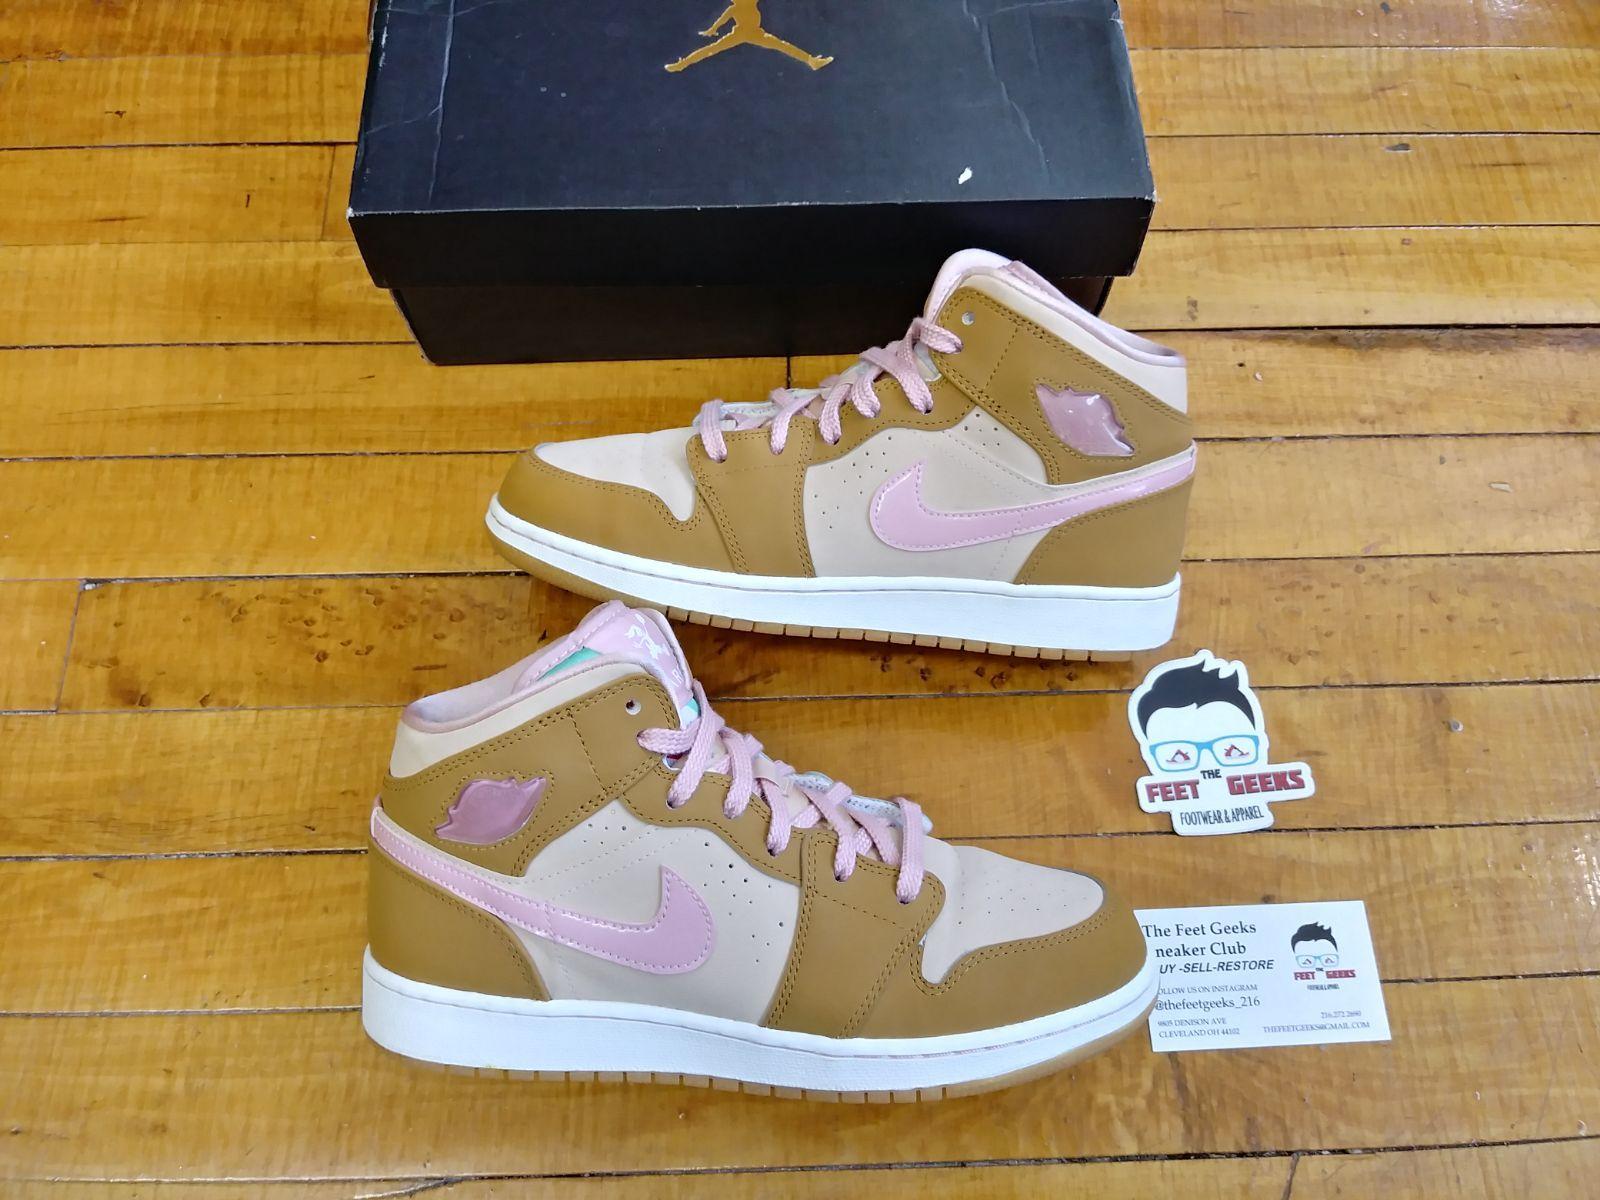 jordan shoes 6.5 cheap online